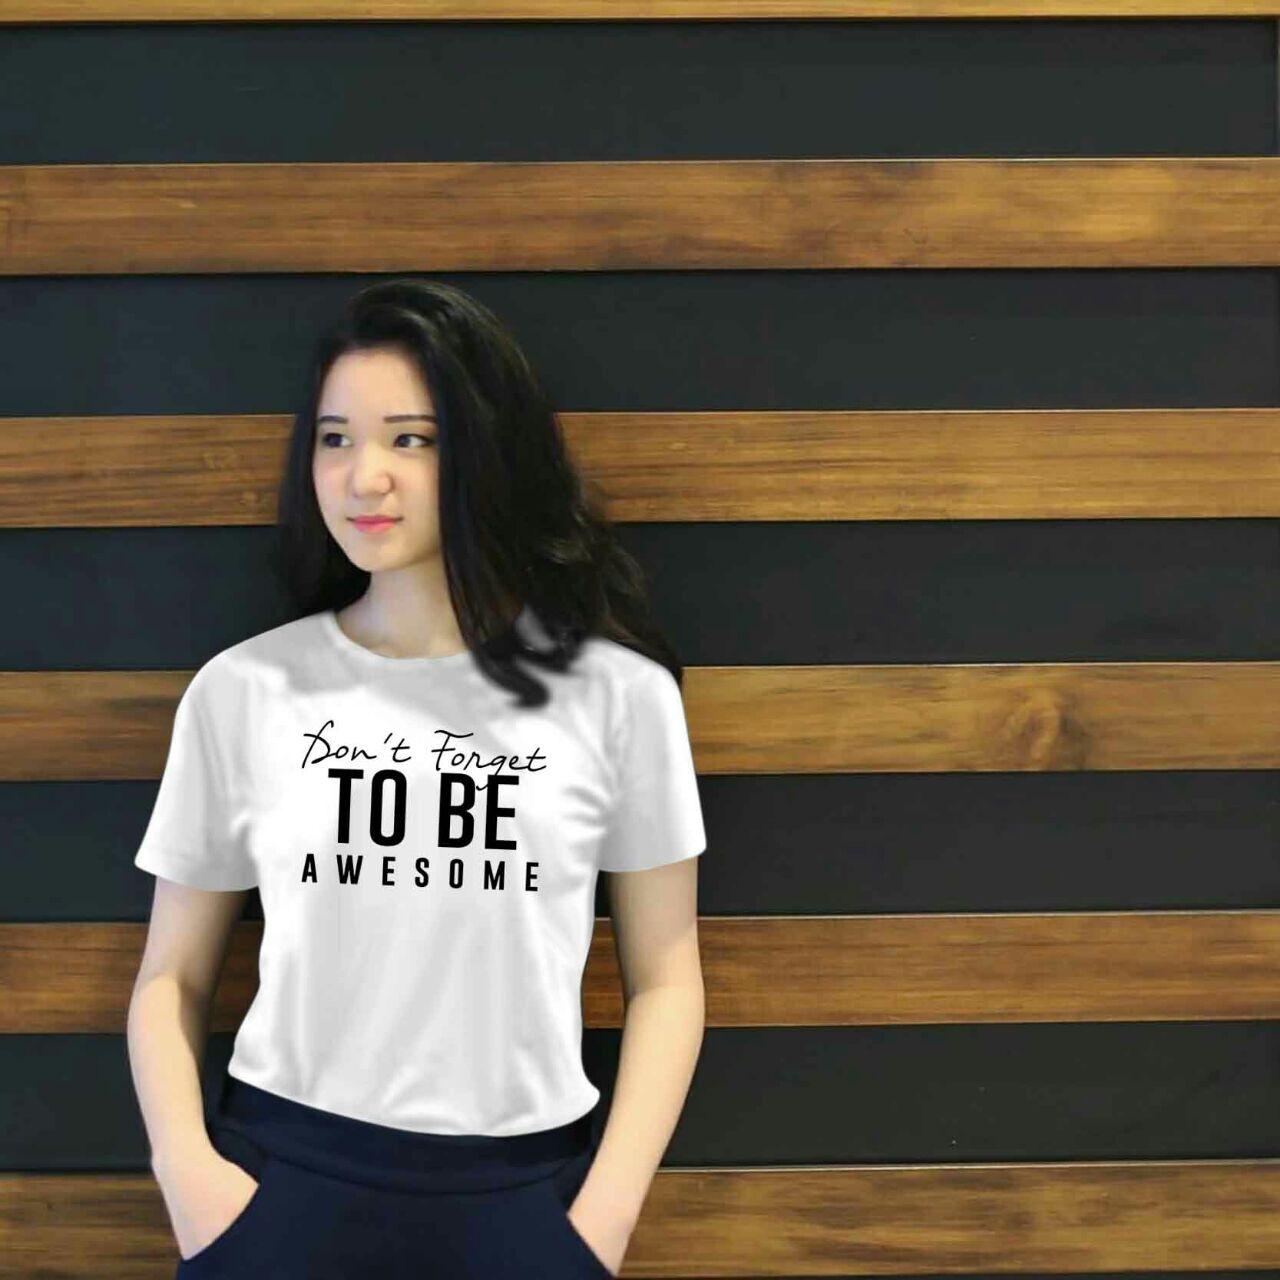 XV Kaos Wanita tee to be awesome / T-shirt Distro Wanita / Baju Atasan